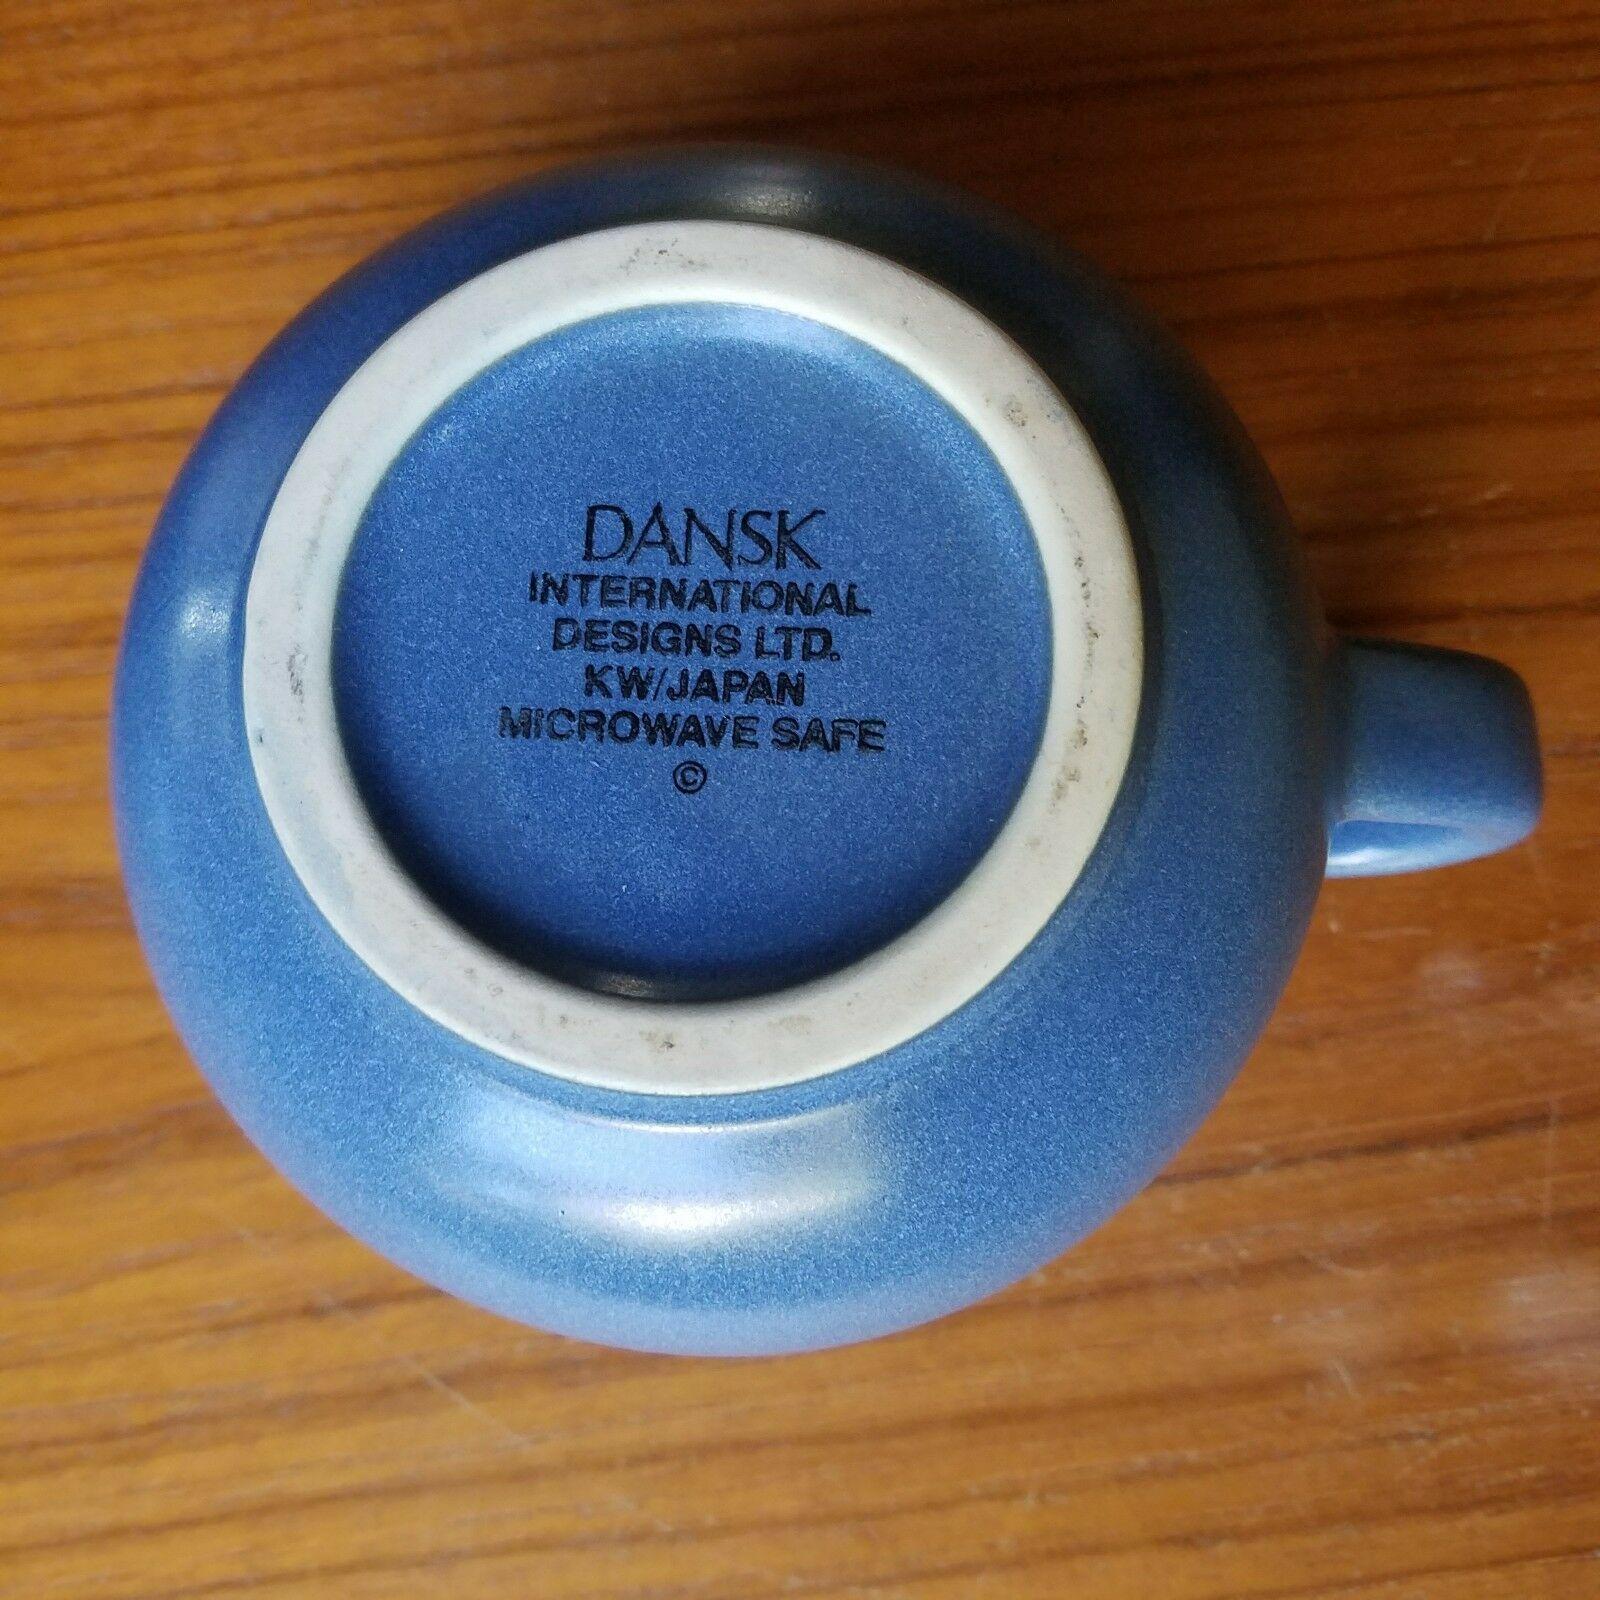 Dansk Mesa Sky Blue Creamer and Sugar Bowl and 50 similar items